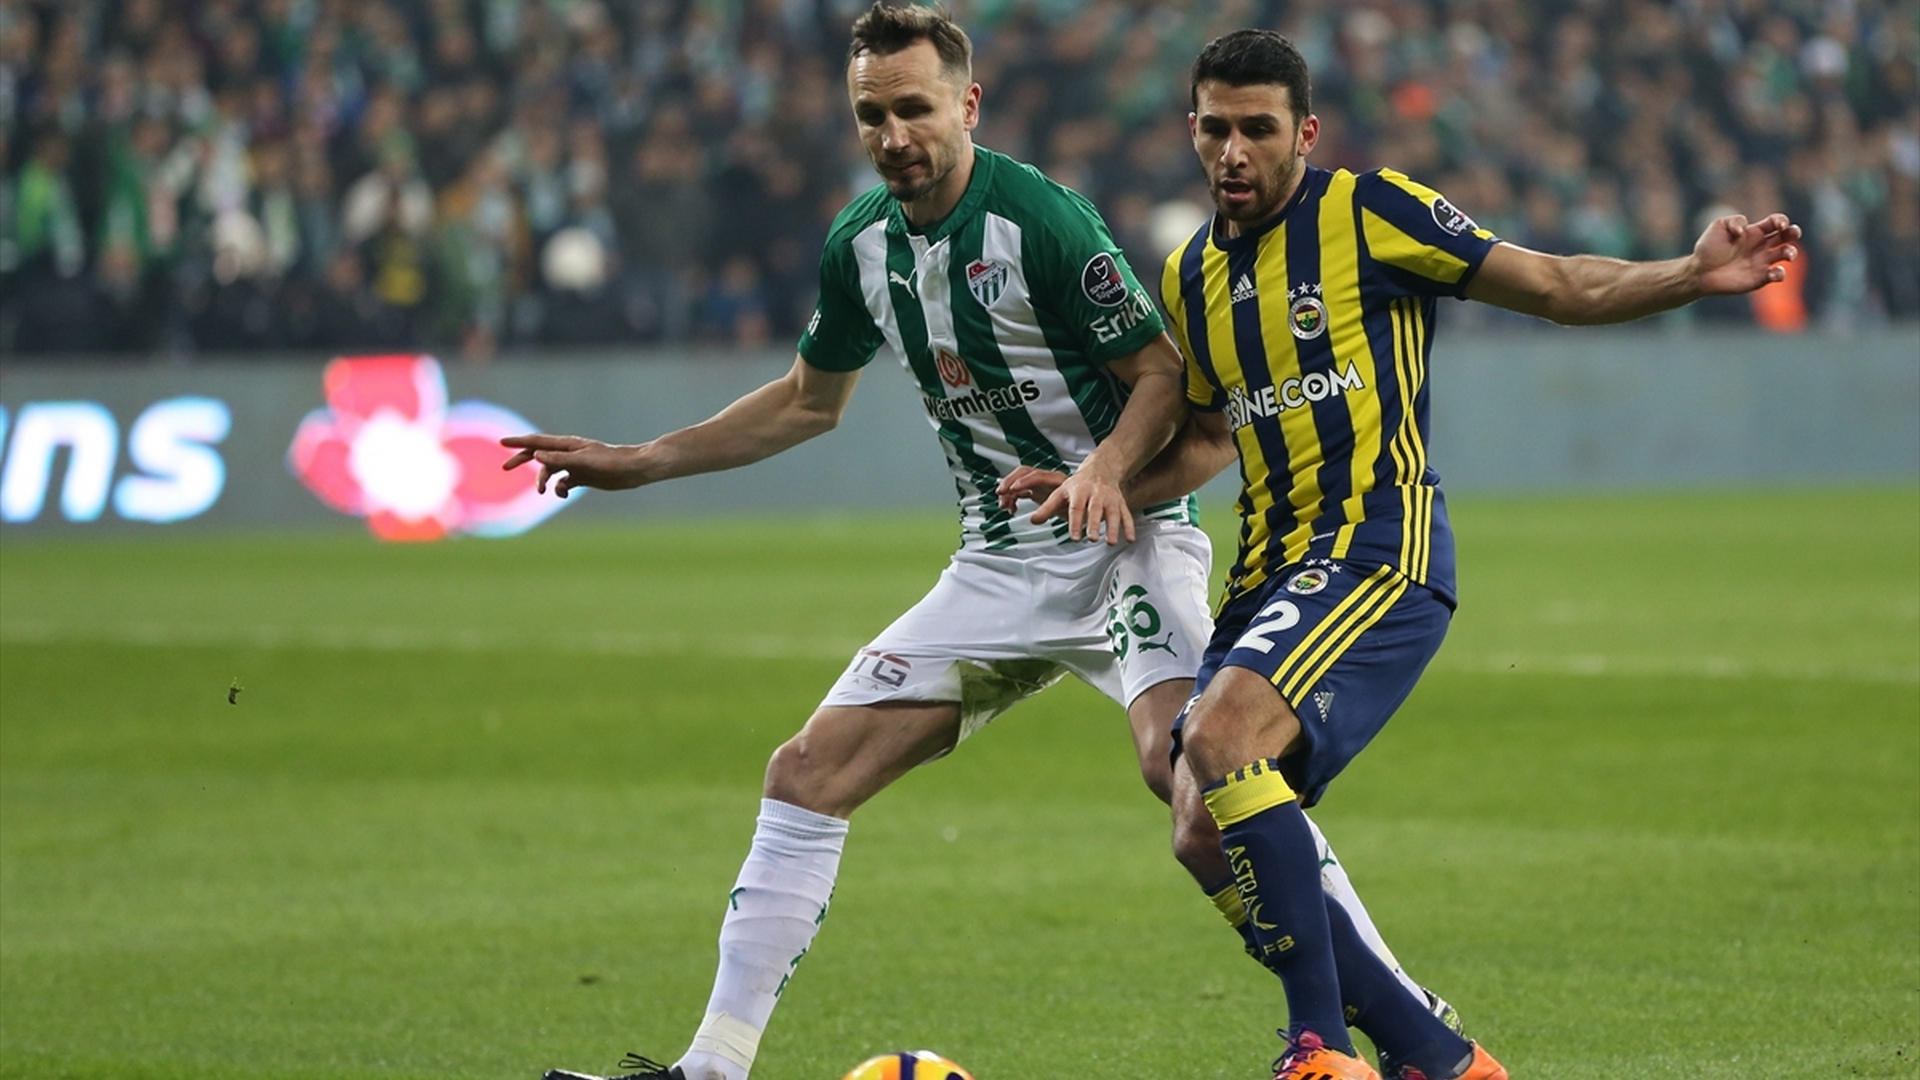 Tomas Sivok Ismail Koybasi Bursaspor Fenerbahce 1122017